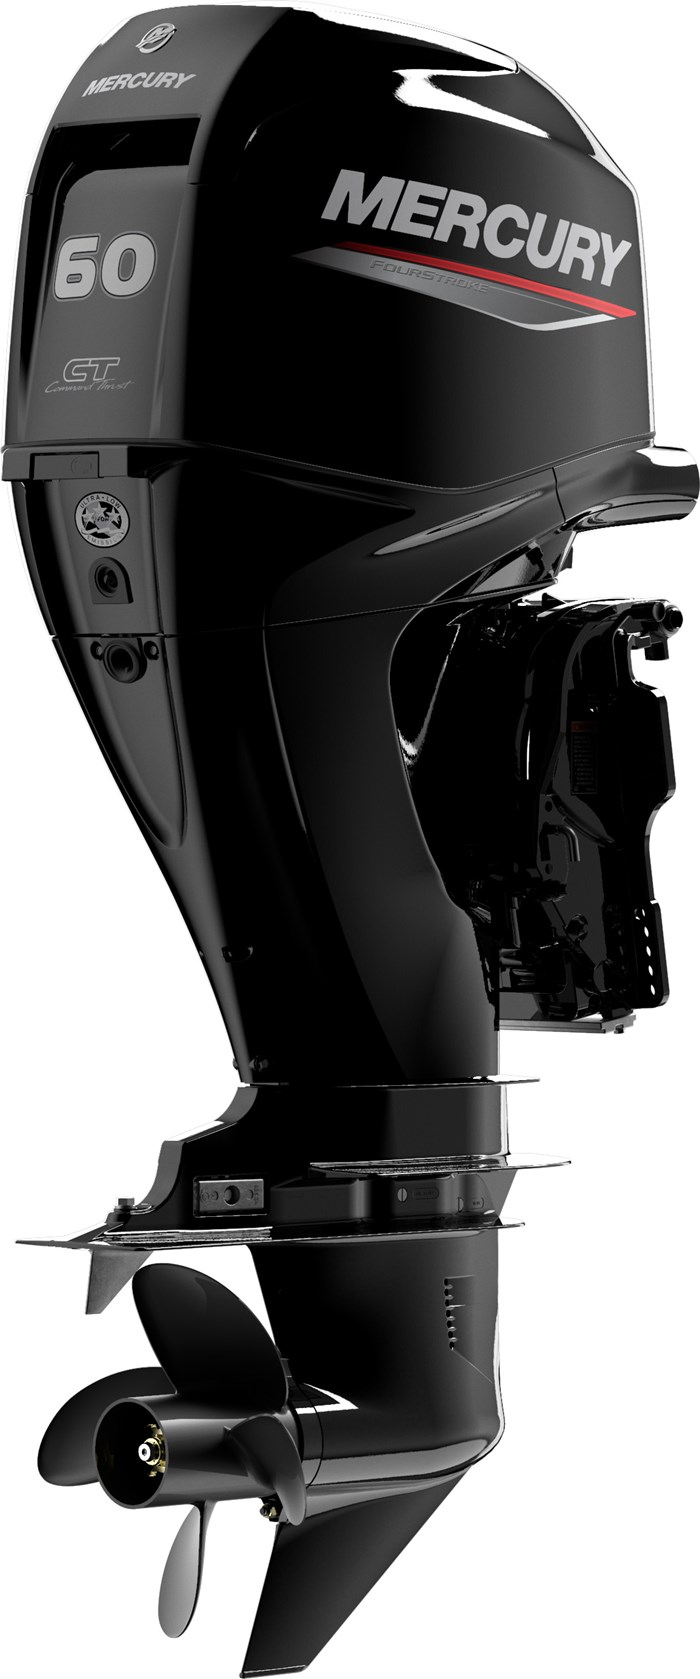 2021 Mercury 60 ELPT CT EFI 4-Stroke Photo 3 of 4